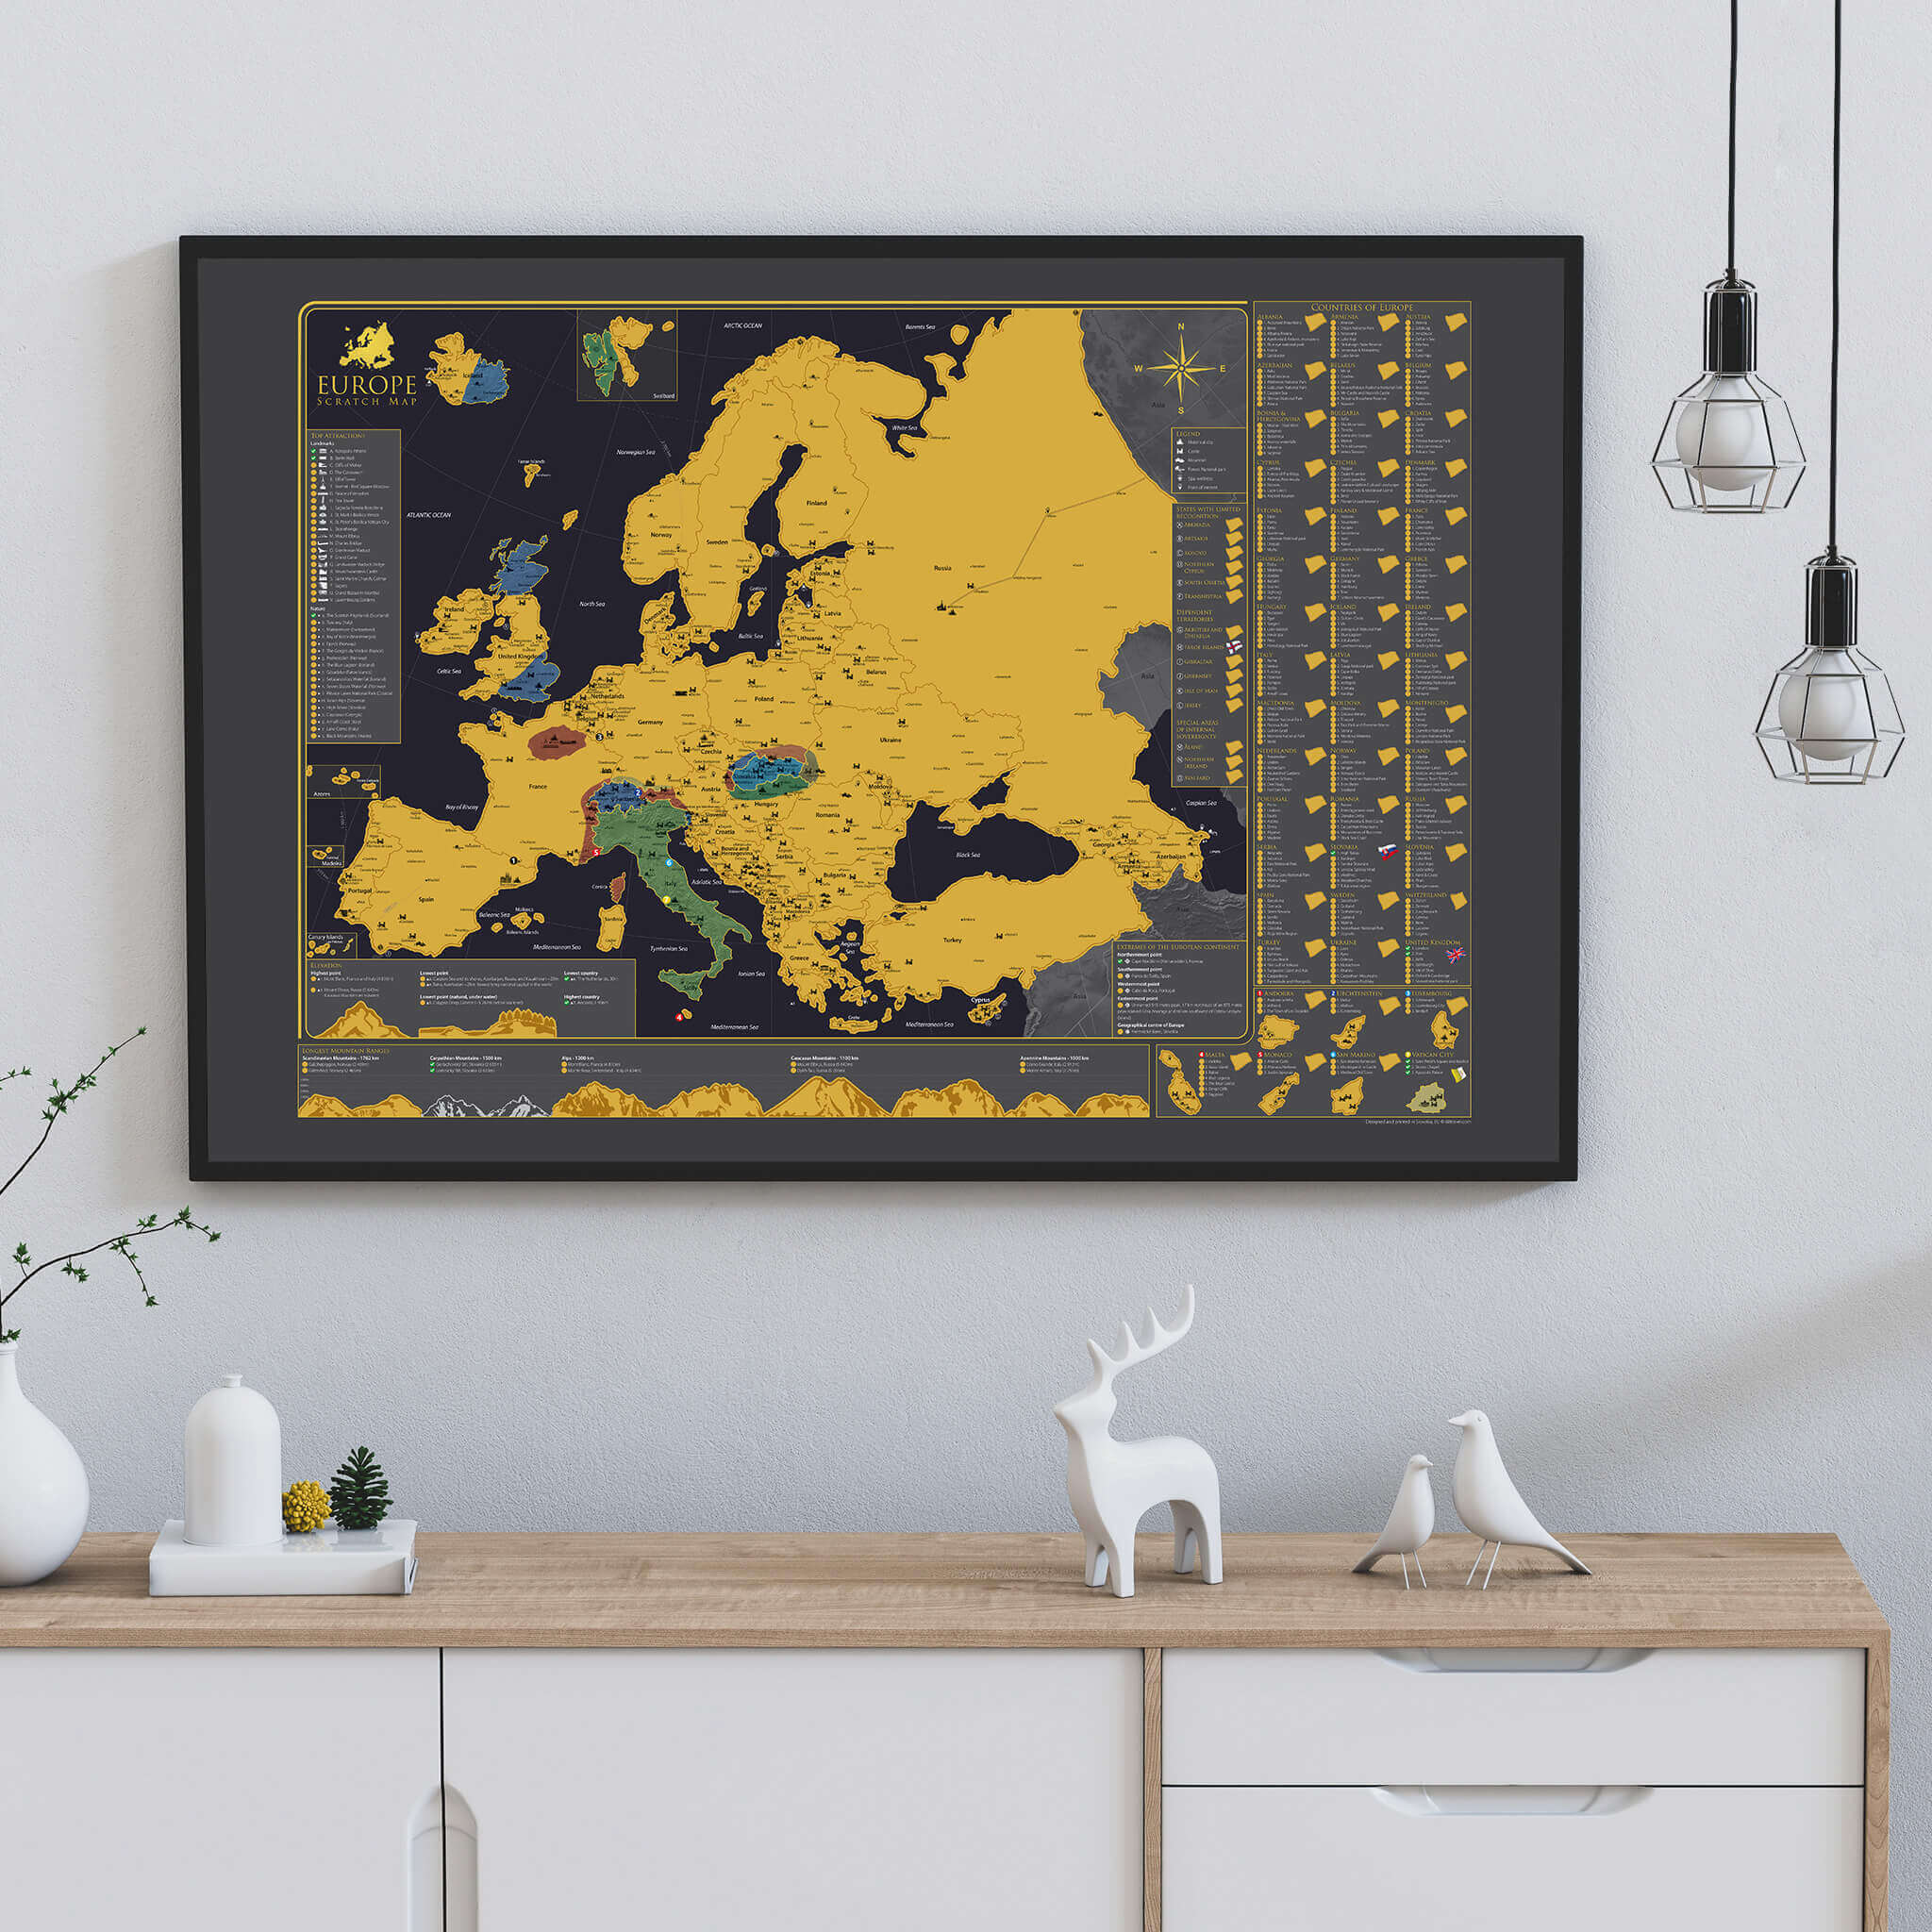 Rubbelkarte Europa - An einer Wand